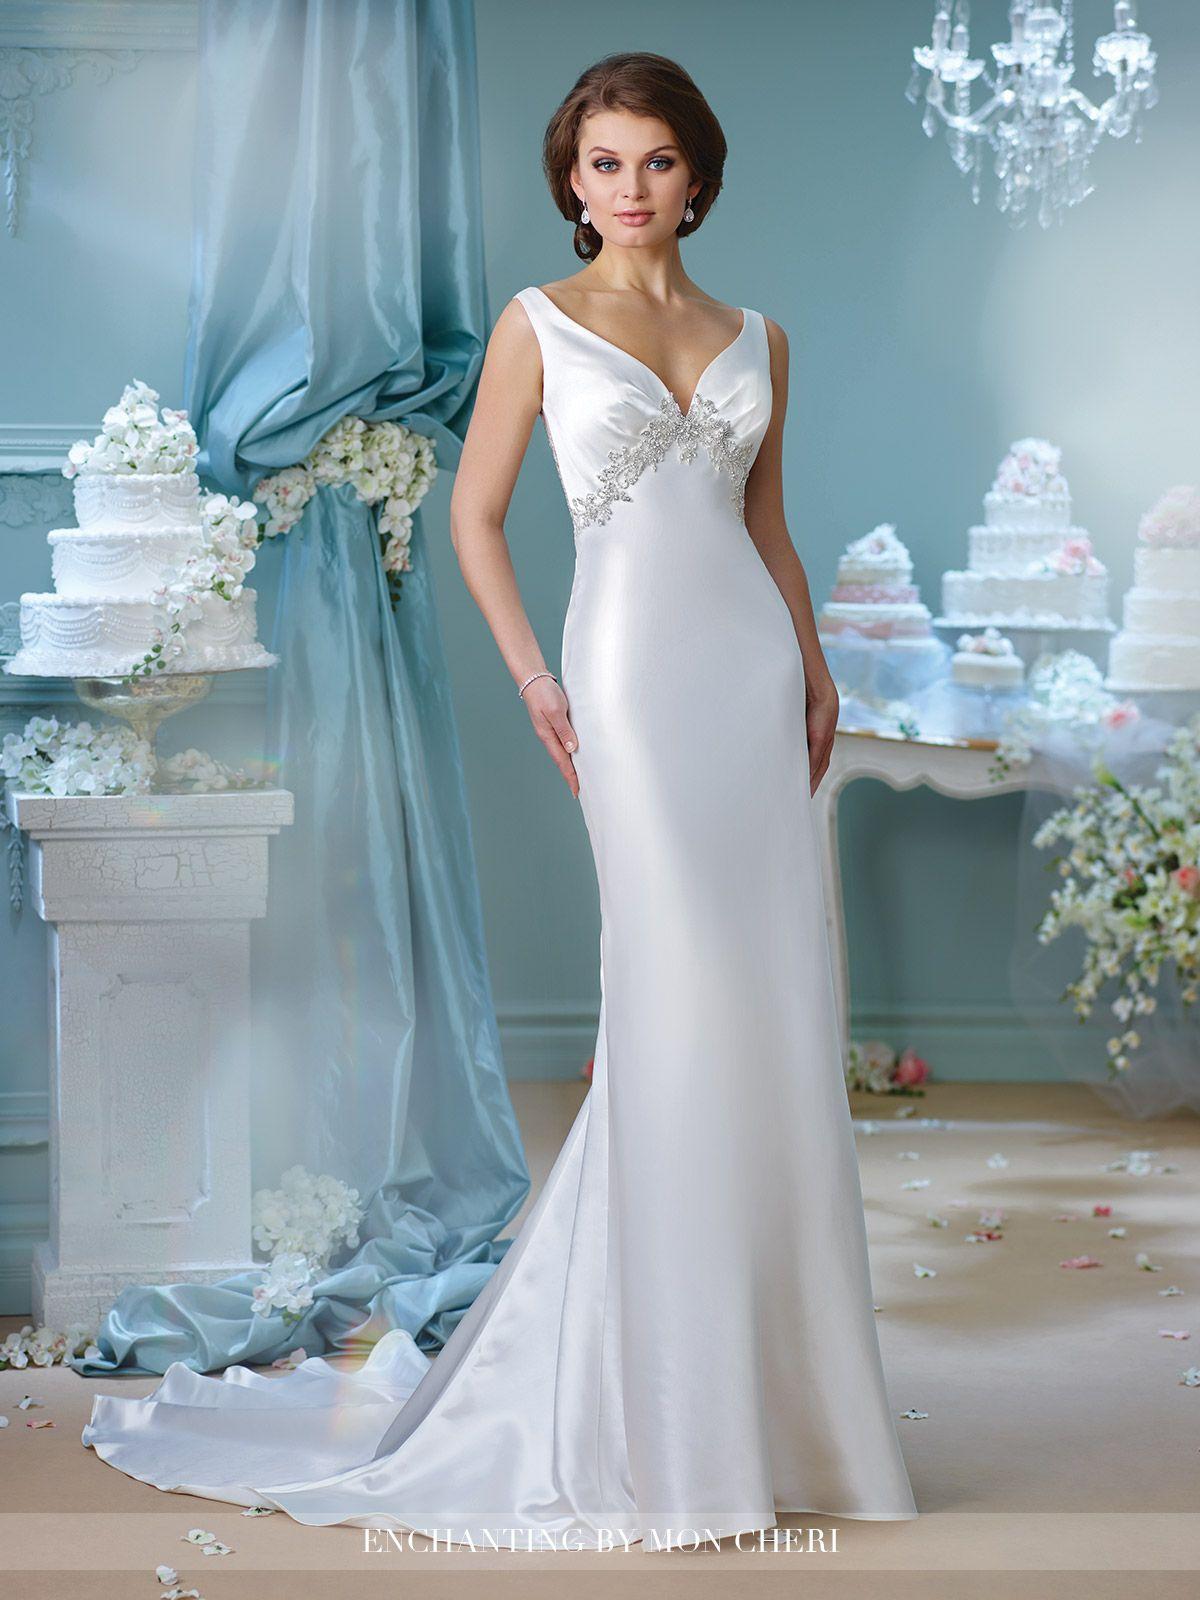 Hand Beaded Tumpet Wedding Dress- 216165- Enchanting by Mon Cheri ...